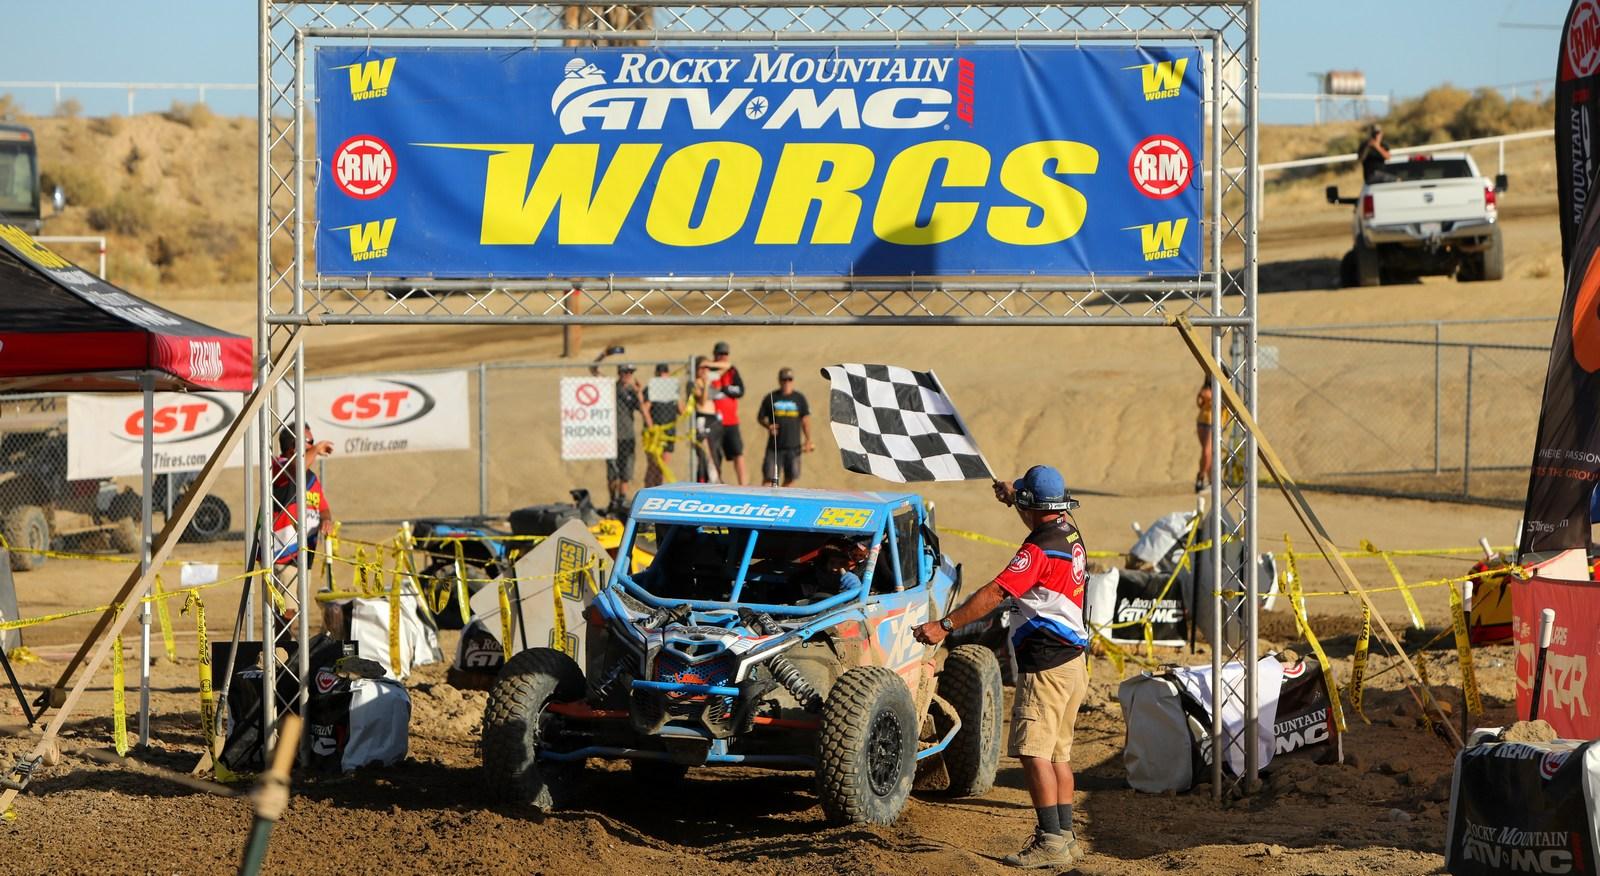 2019-07-beau-judge-win-sxs-worcs-racing